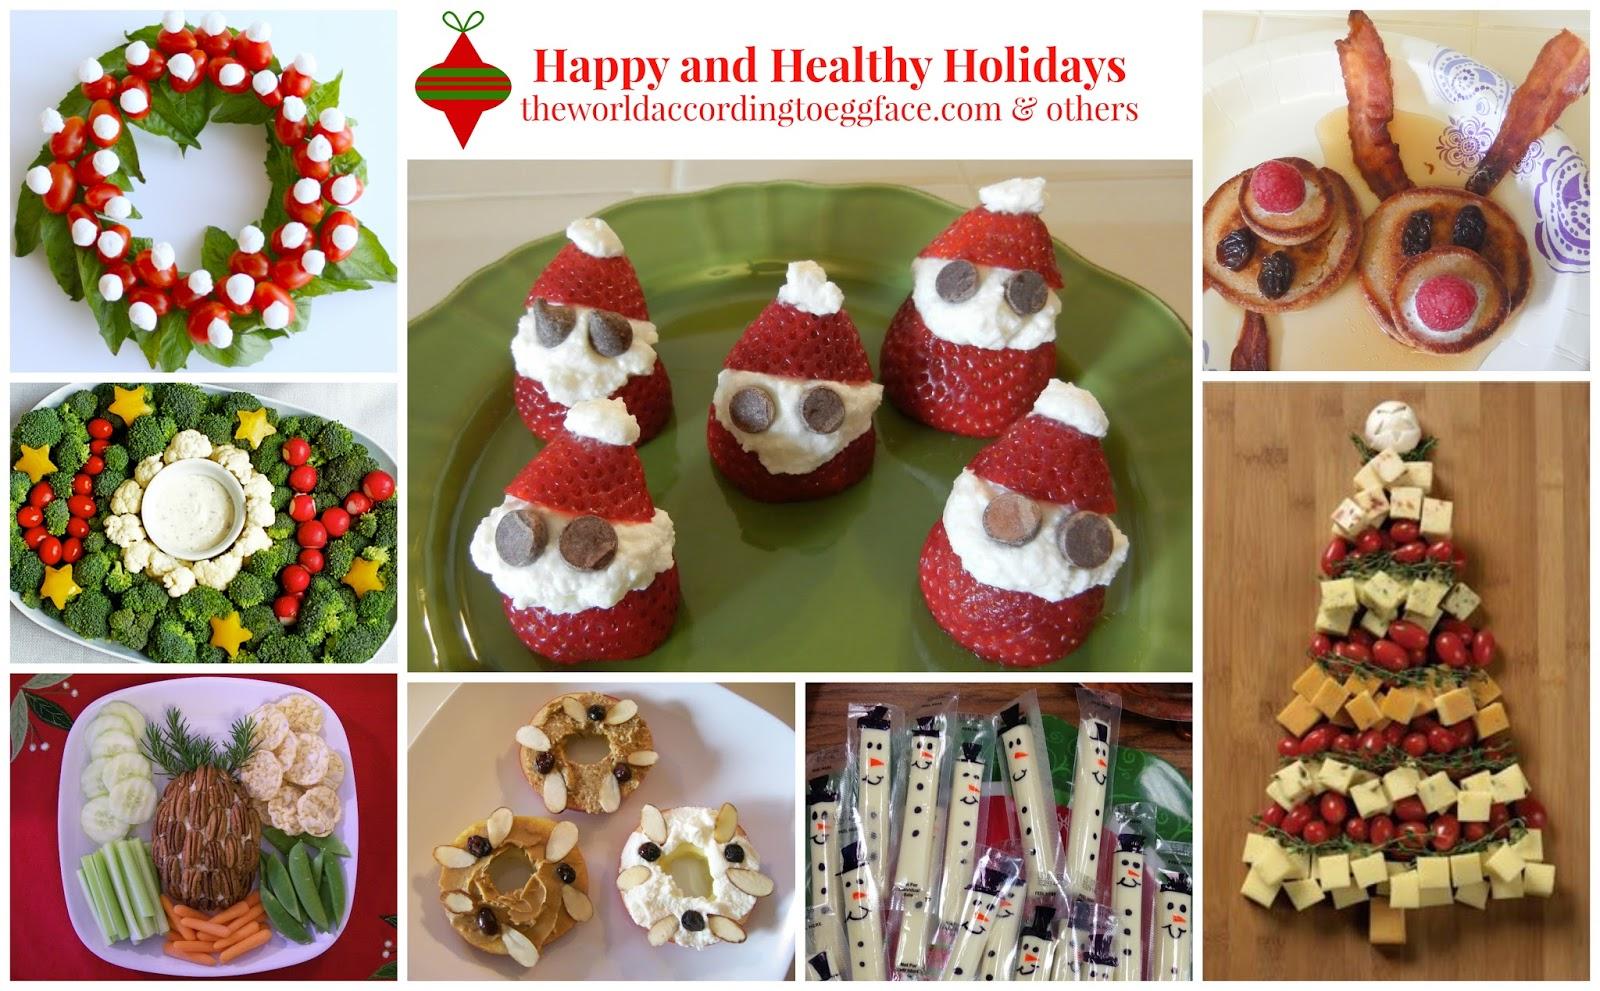 Theworldaccordingtoeggface Healthy Holiday Food Ideas Round Up